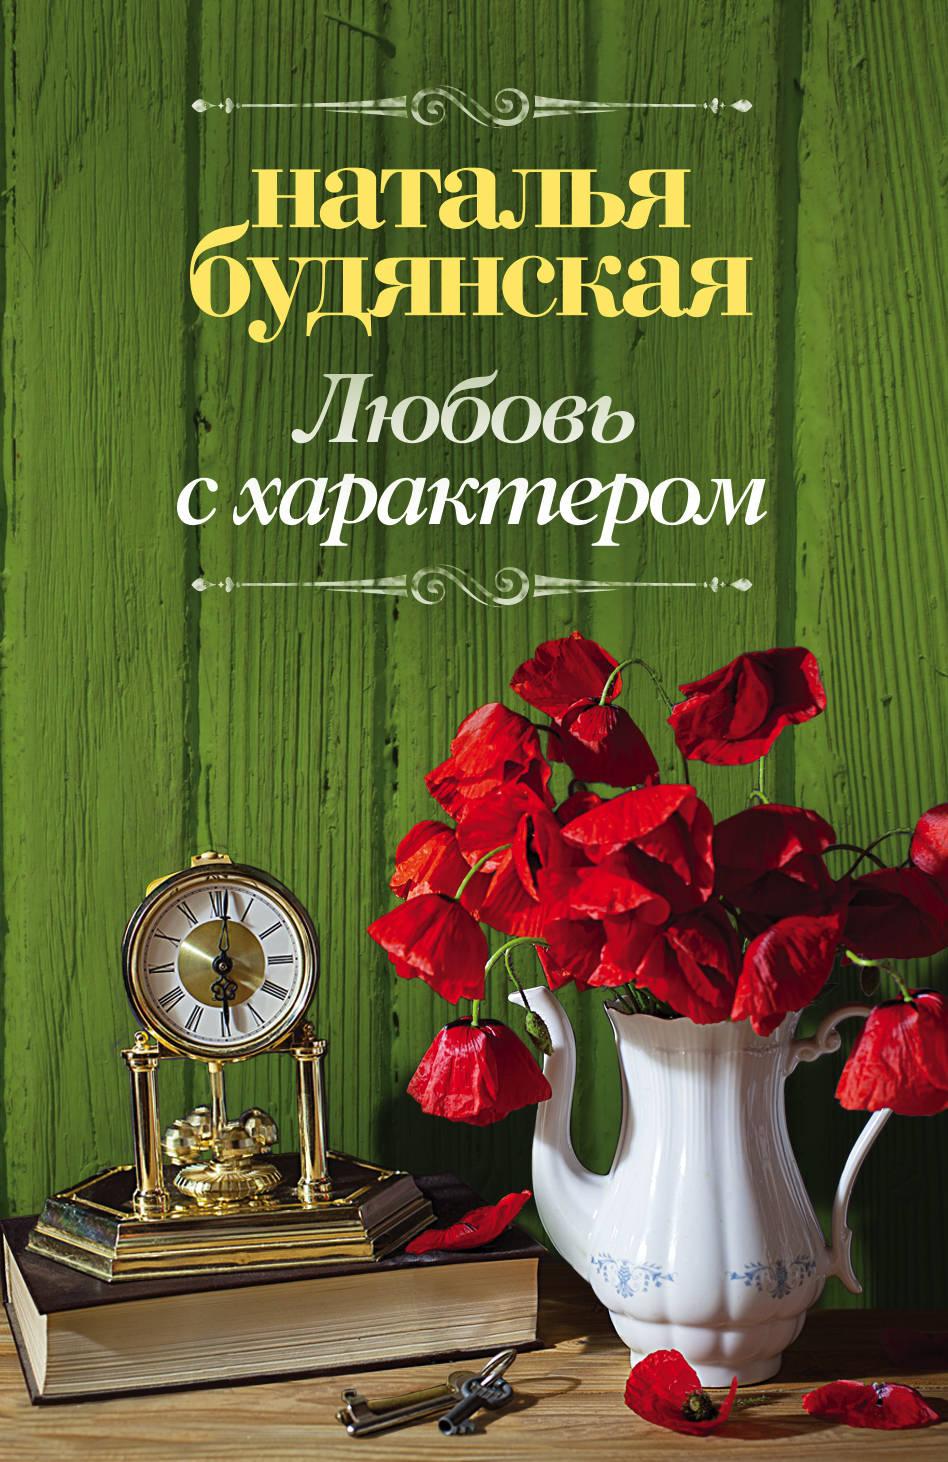 Любовь с характером - Наталья Будянская